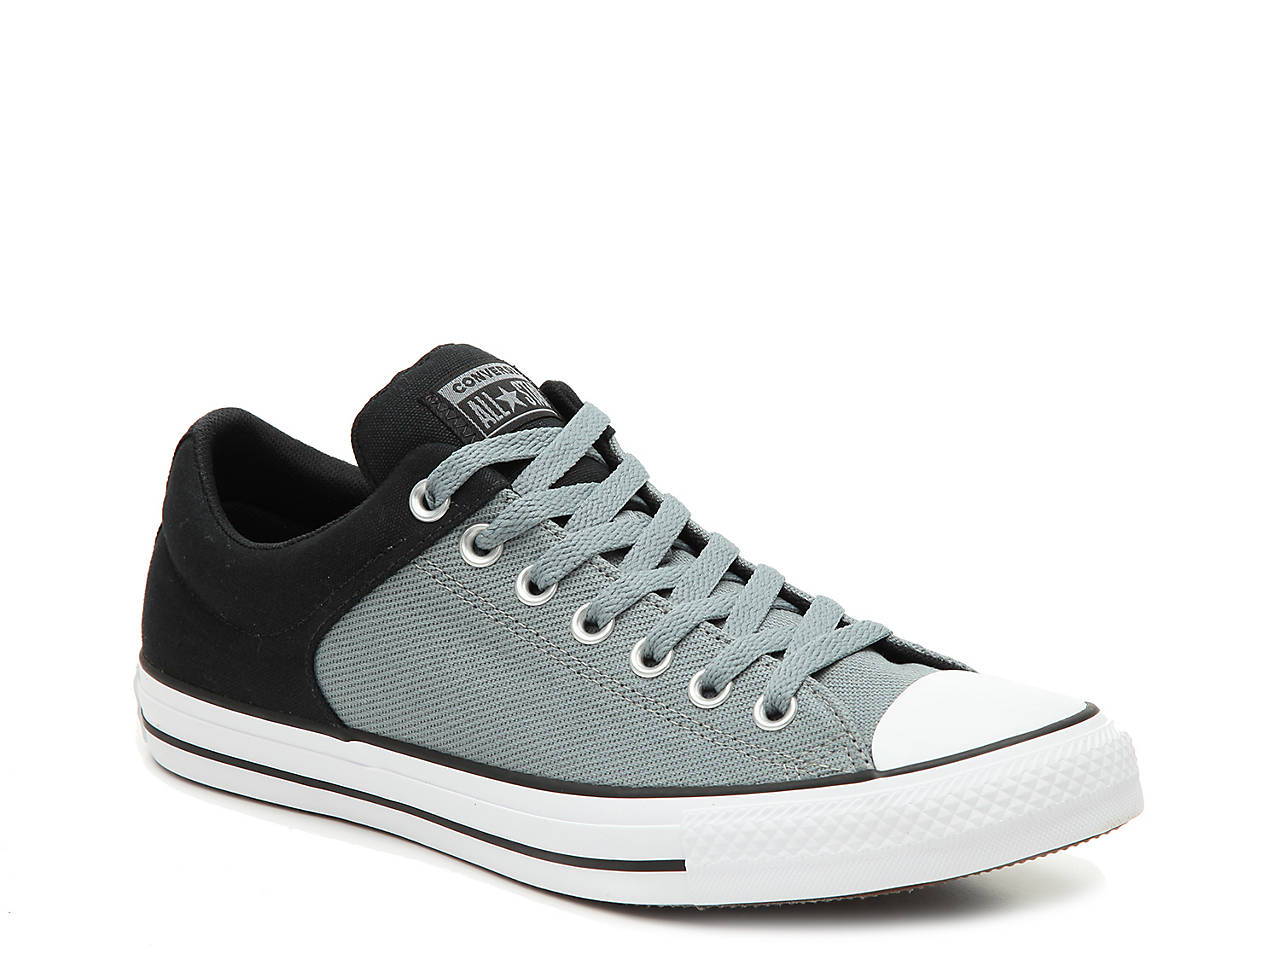 brand new eb2e8 6593a Chuck Taylor All Star Hi Street Sneaker - Women s